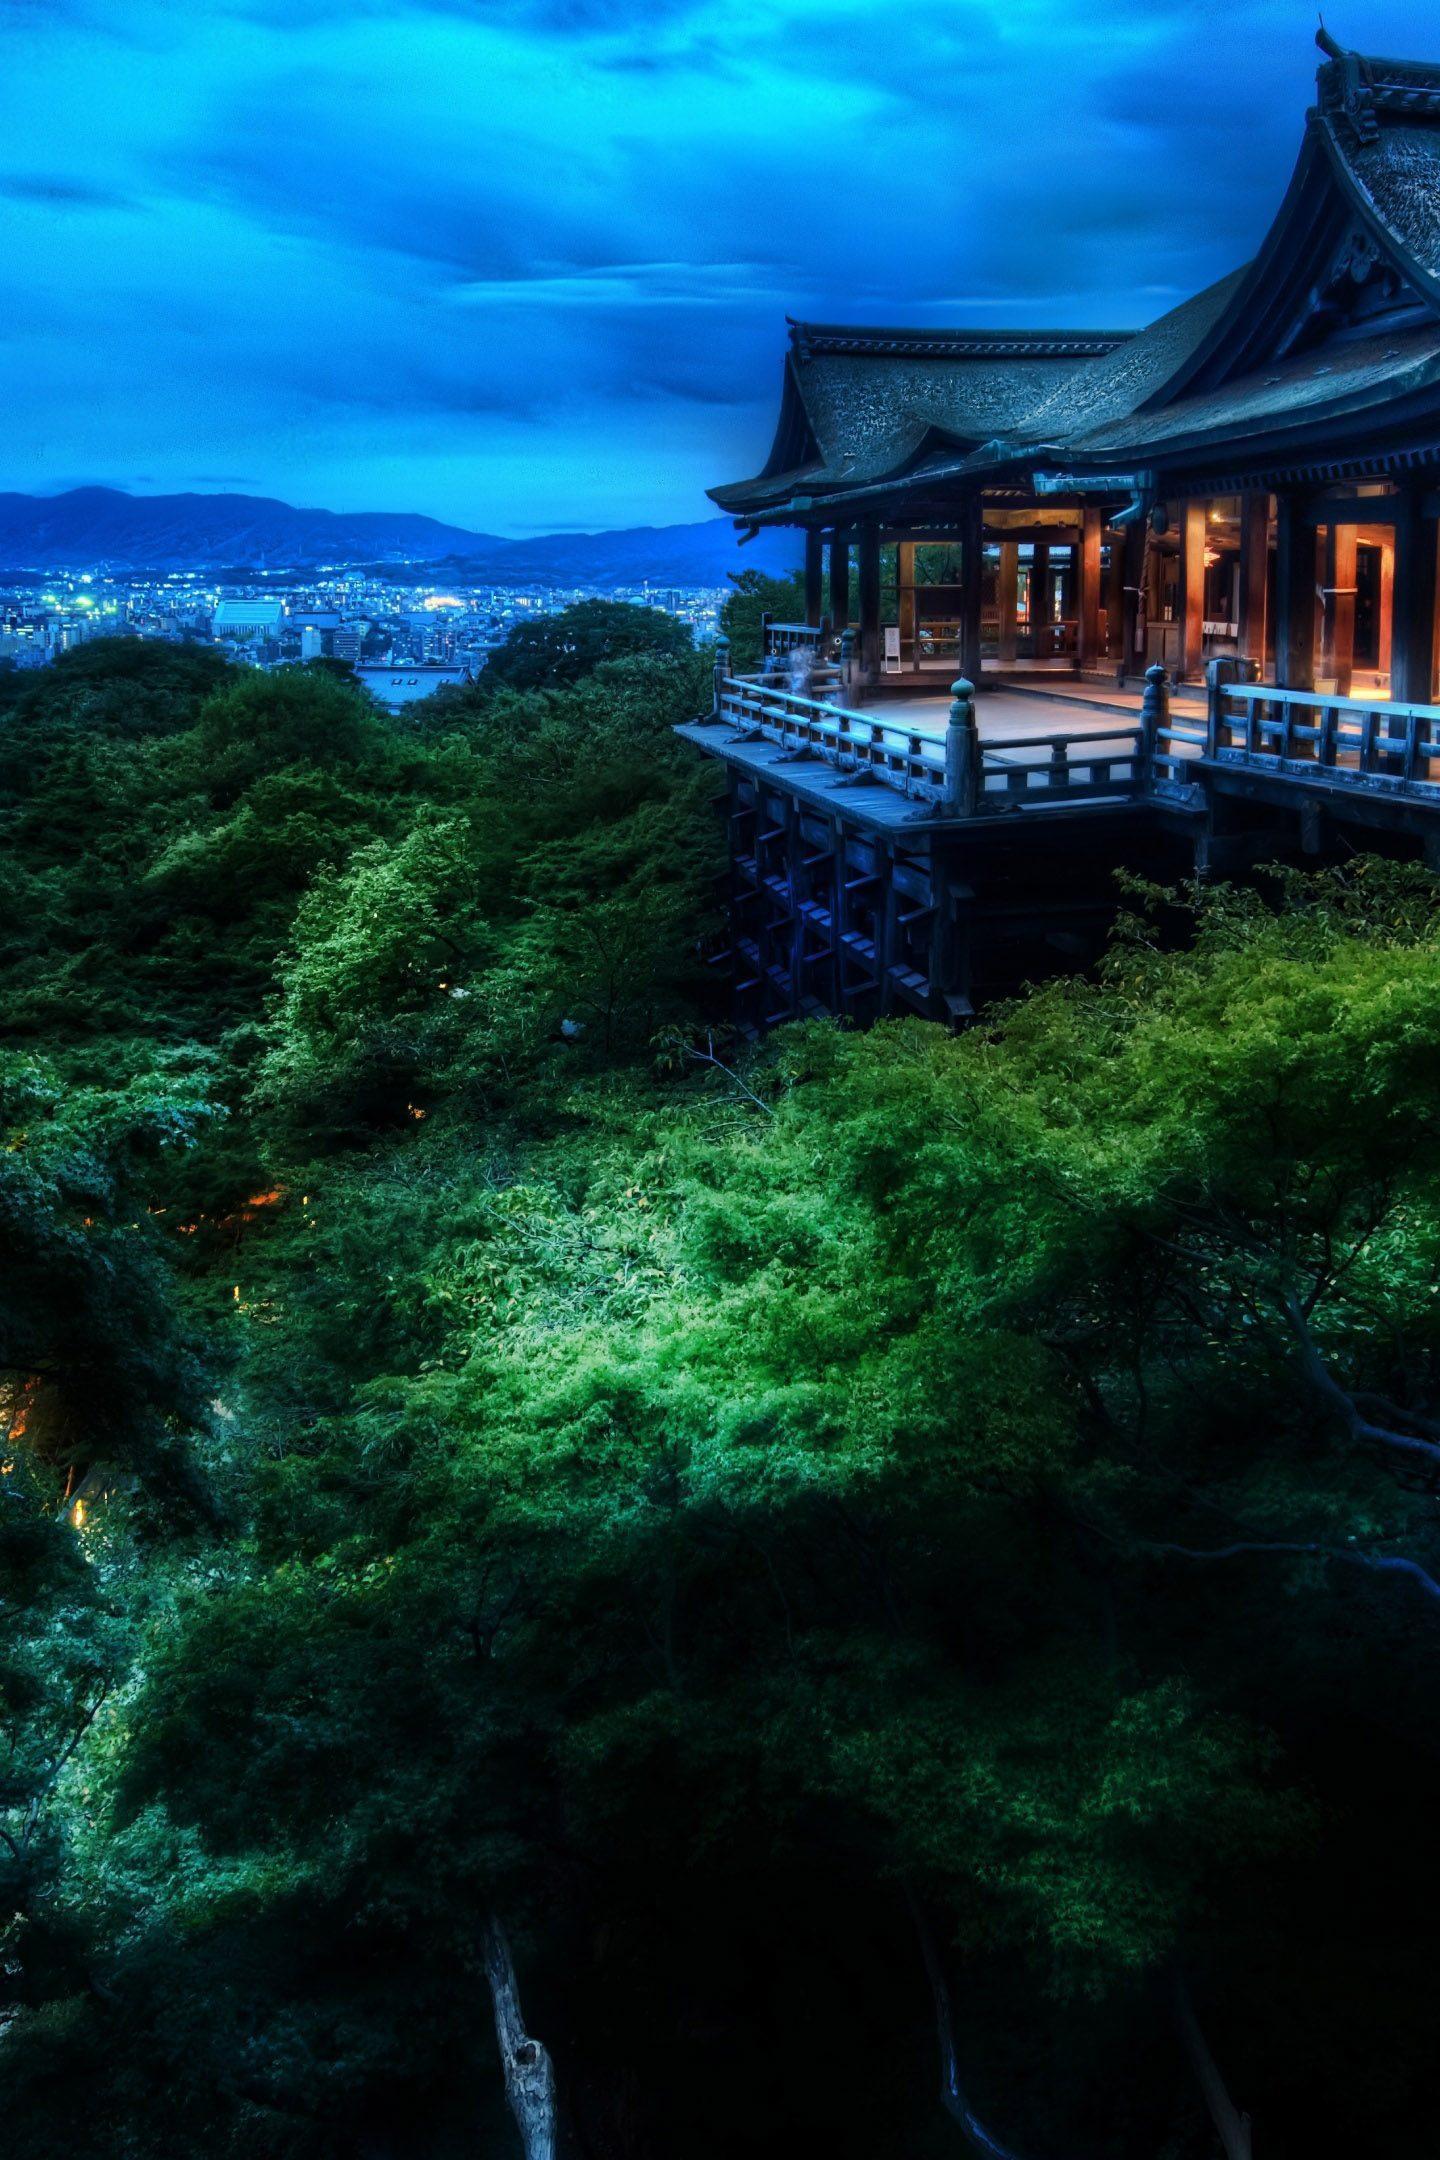 Kyoto Japan Night View 4K Wallpaper - Best Wallpapers